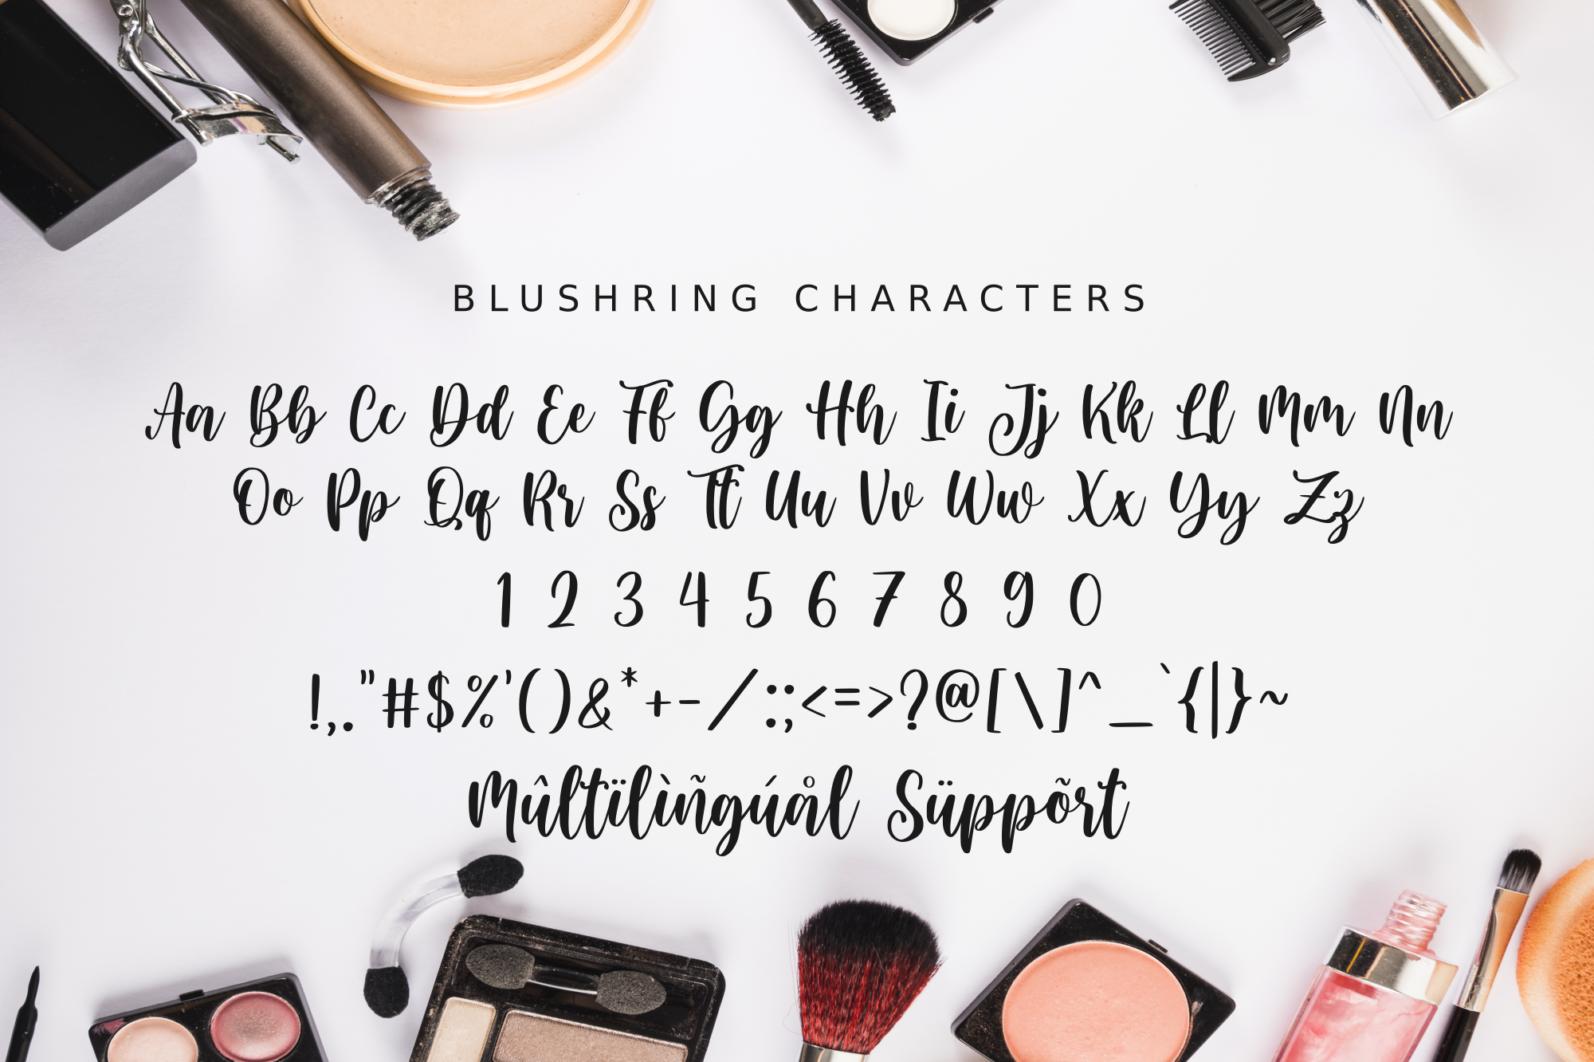 Blushring - blushring10 -